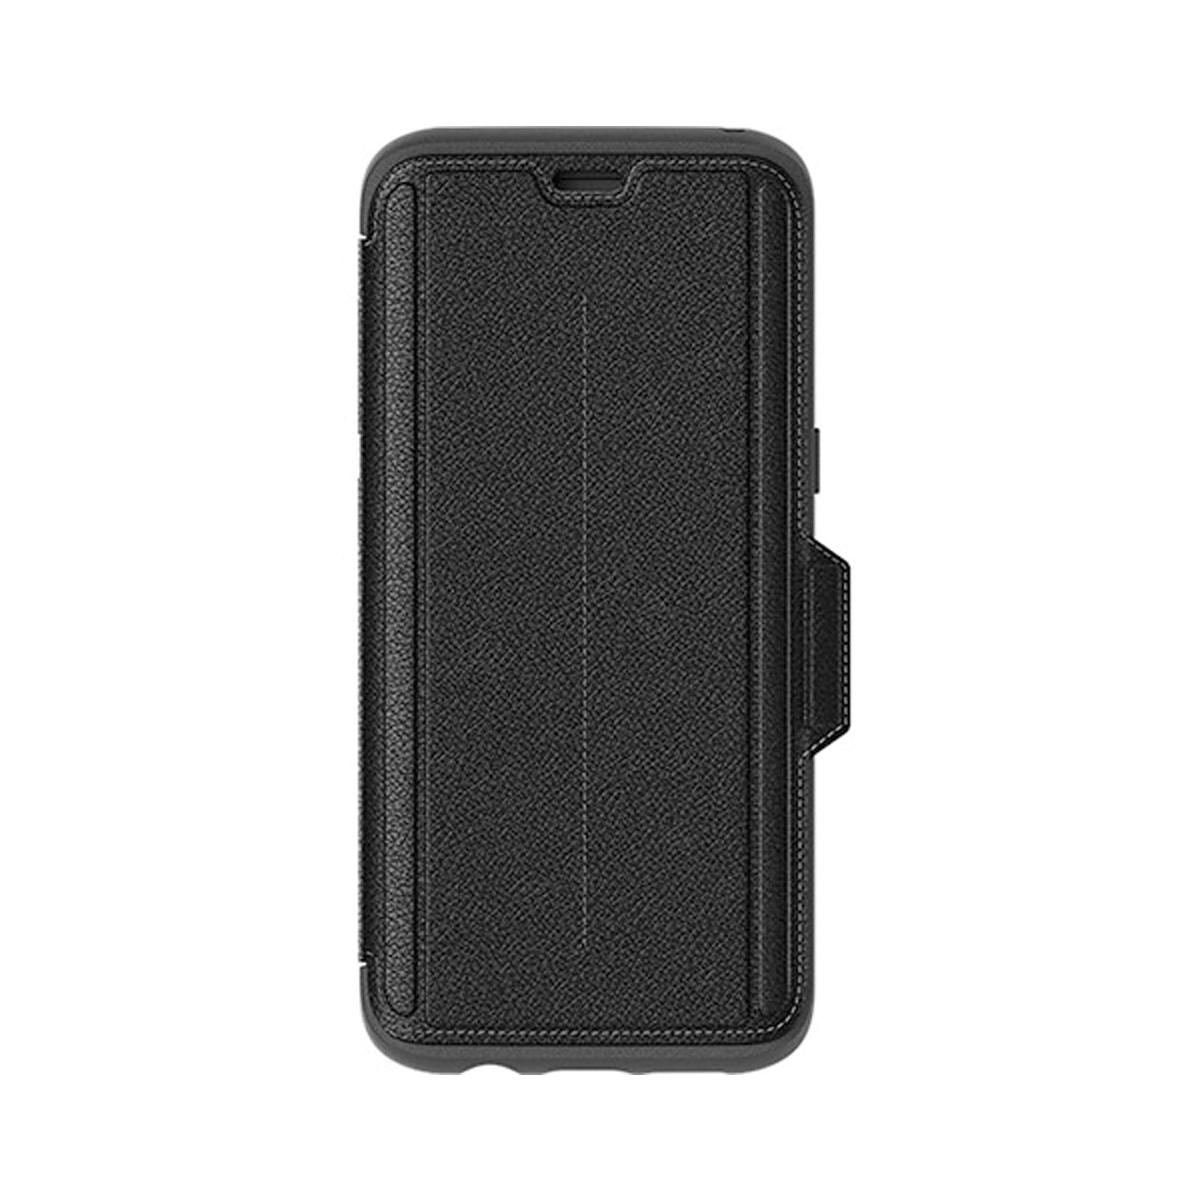 innovative design dbb5f 47682 Otterbox Strada S8 | Mobile | Videotron